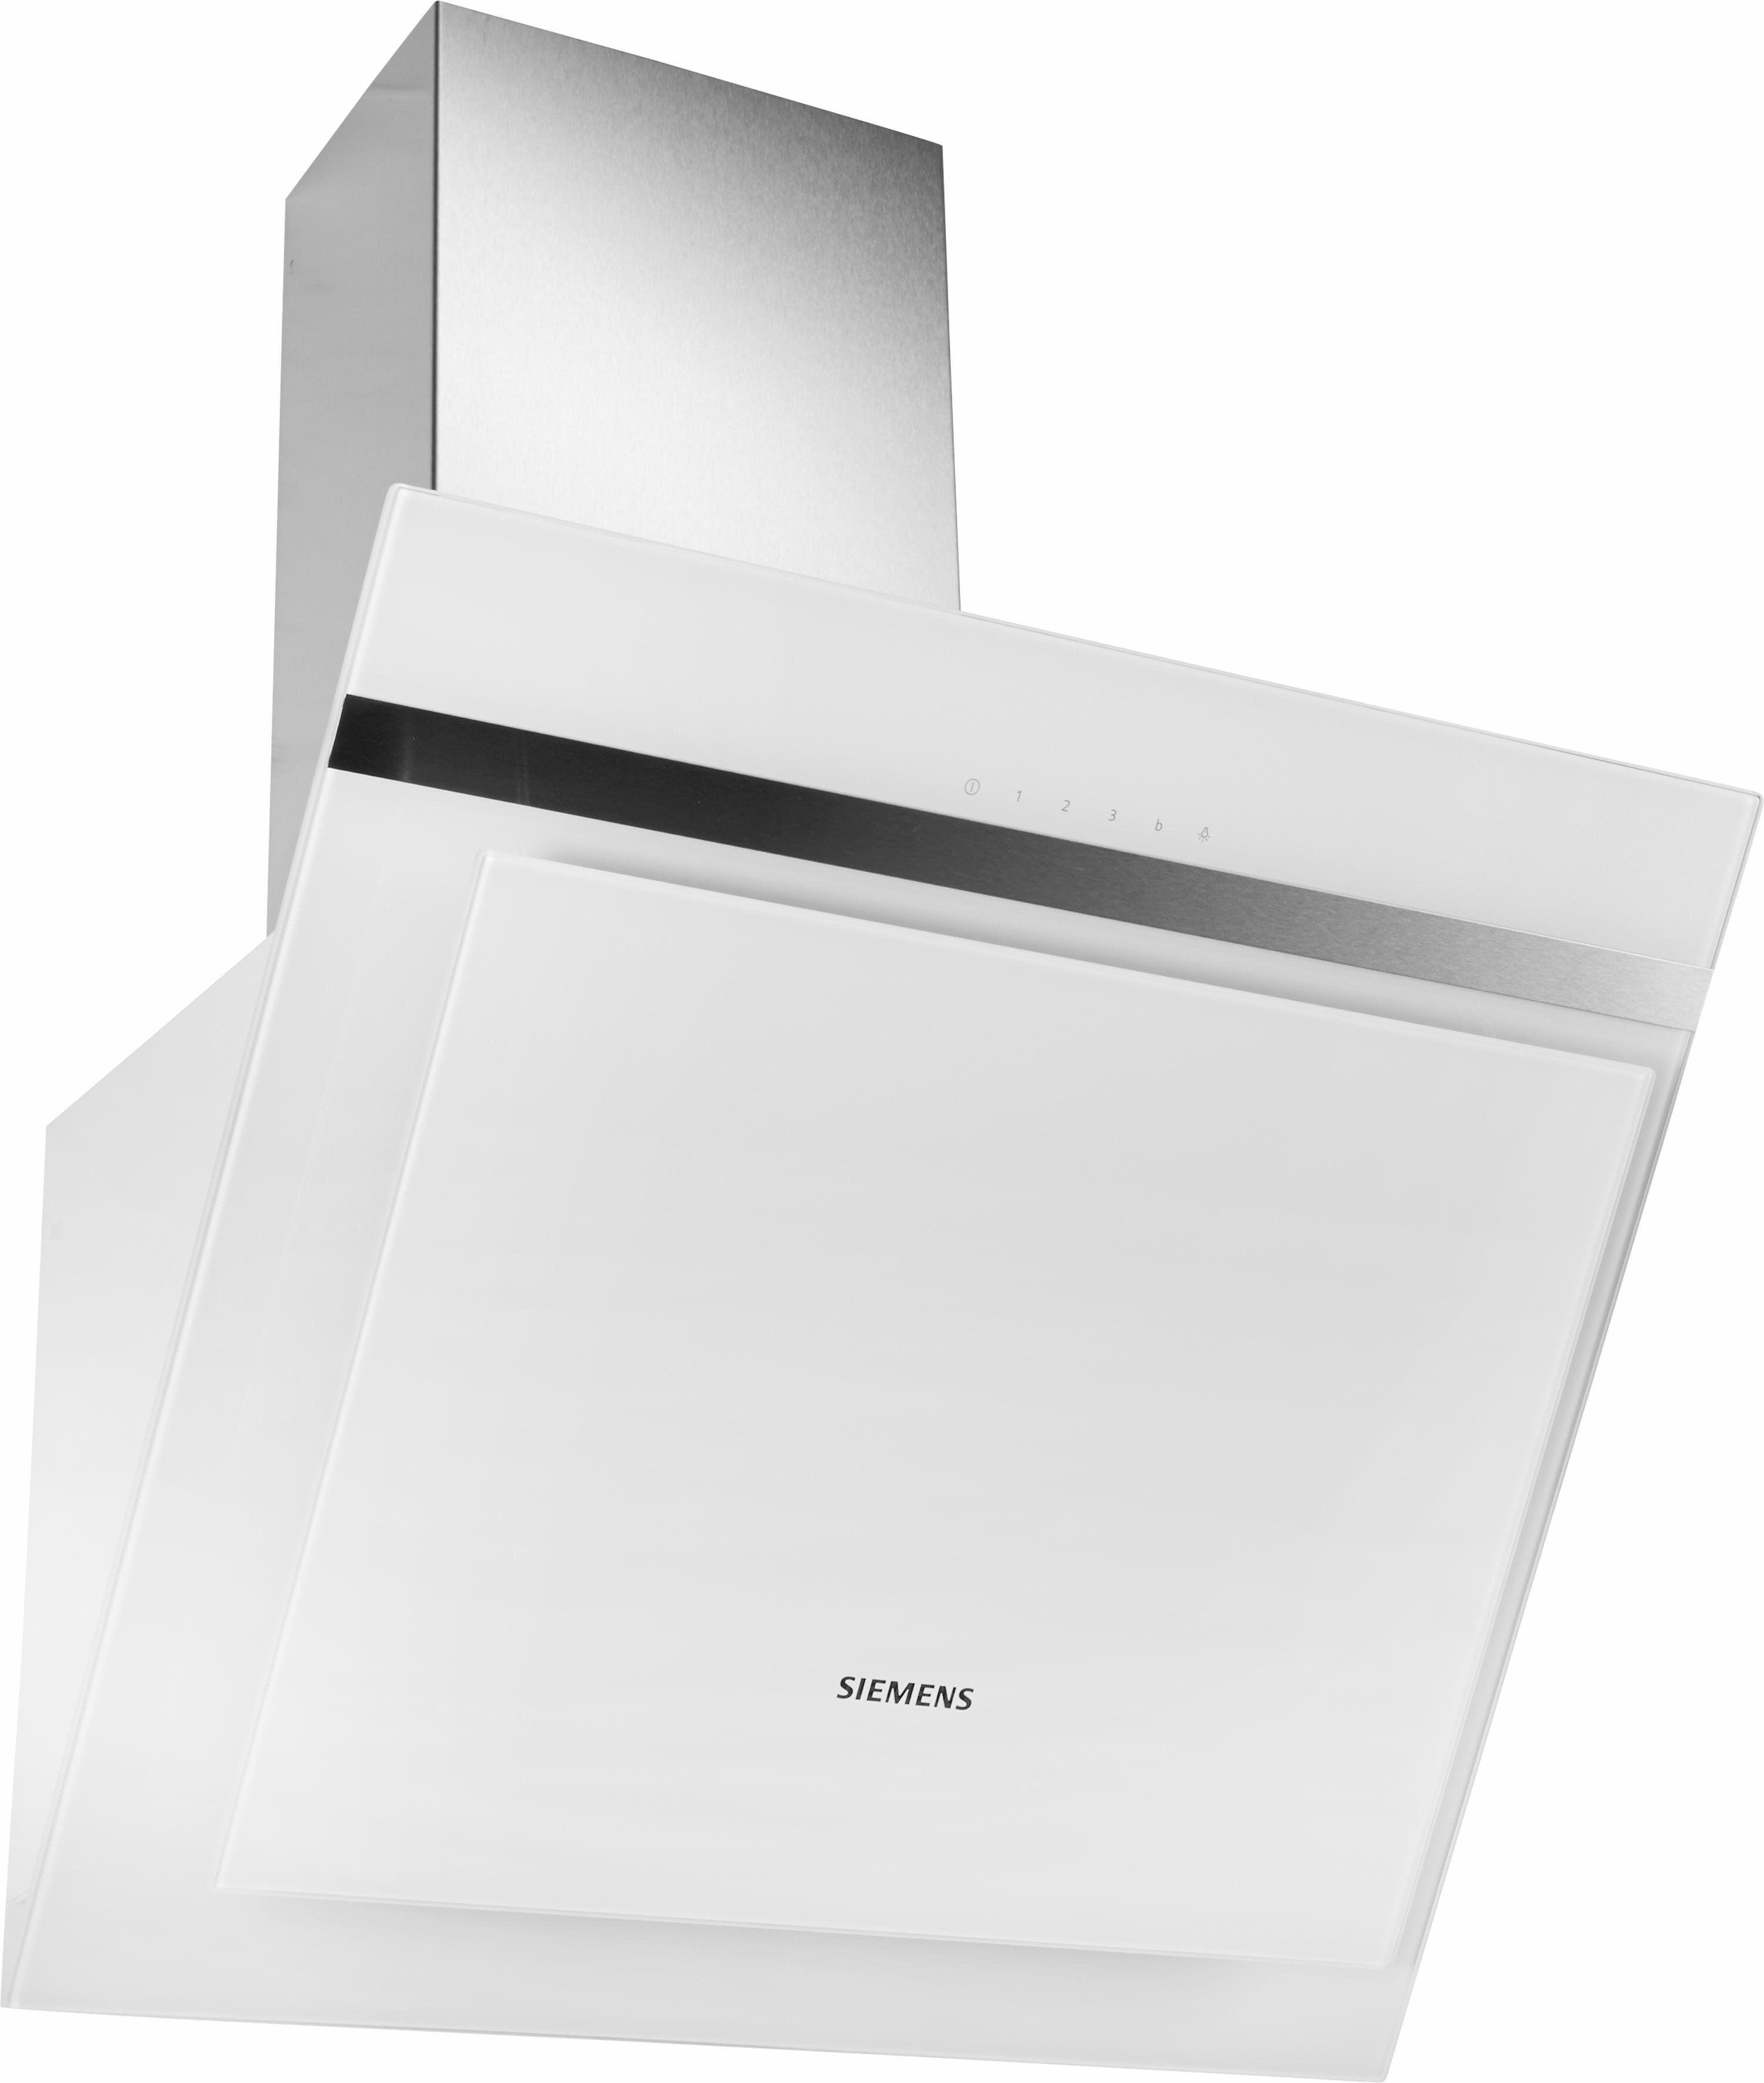 Siemens Kopffreihaube Serie iQ300 LC67KHM20, Energieeffizienzklasse B